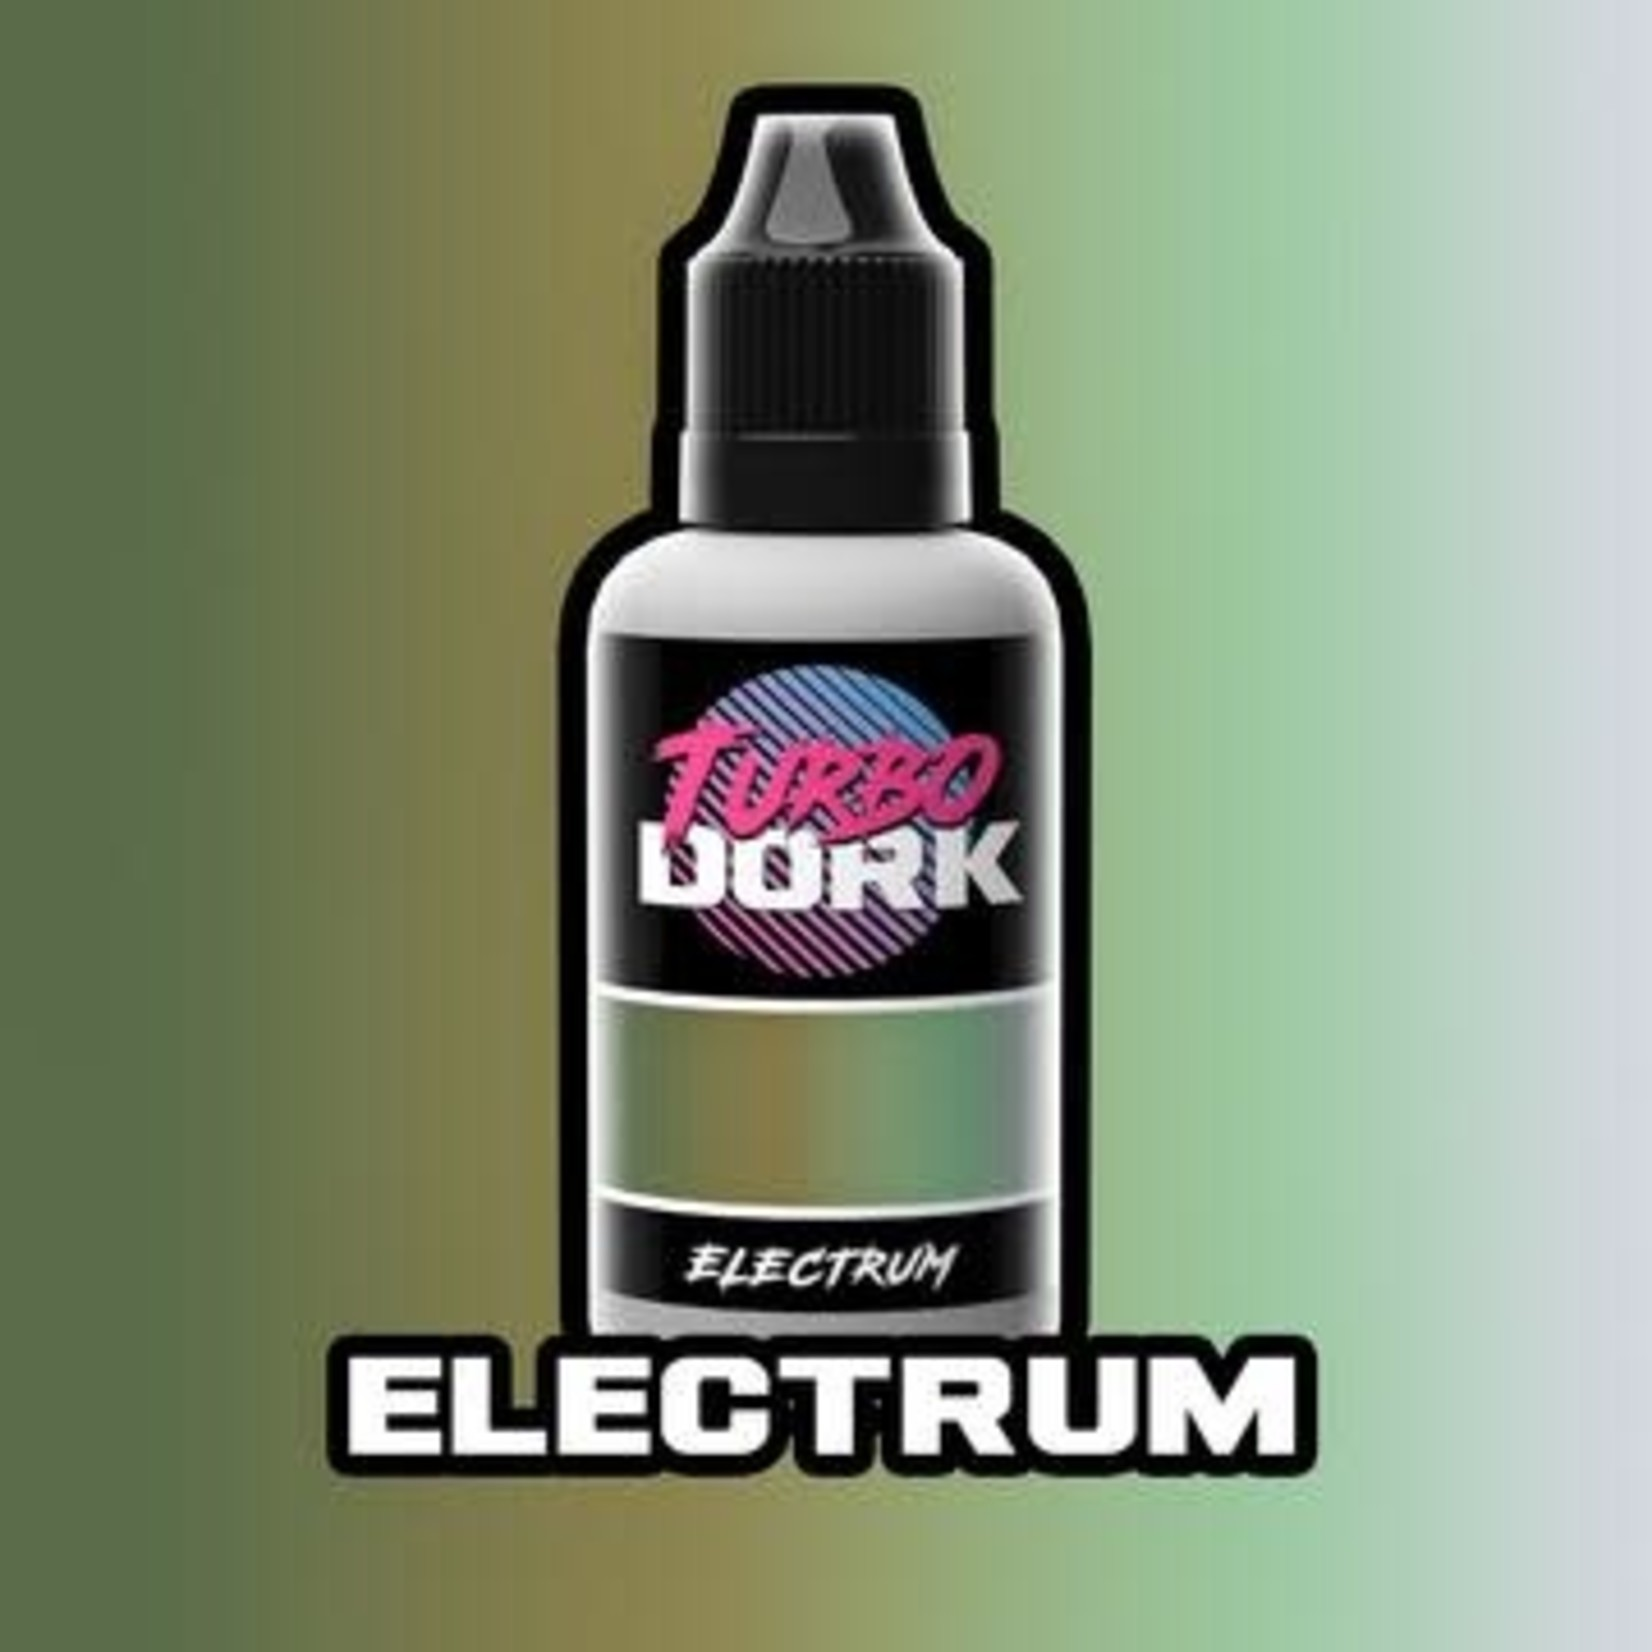 Turbo Dork Turbo Dork Electrum Colorshift Acrylic Paint 20ml Bottle